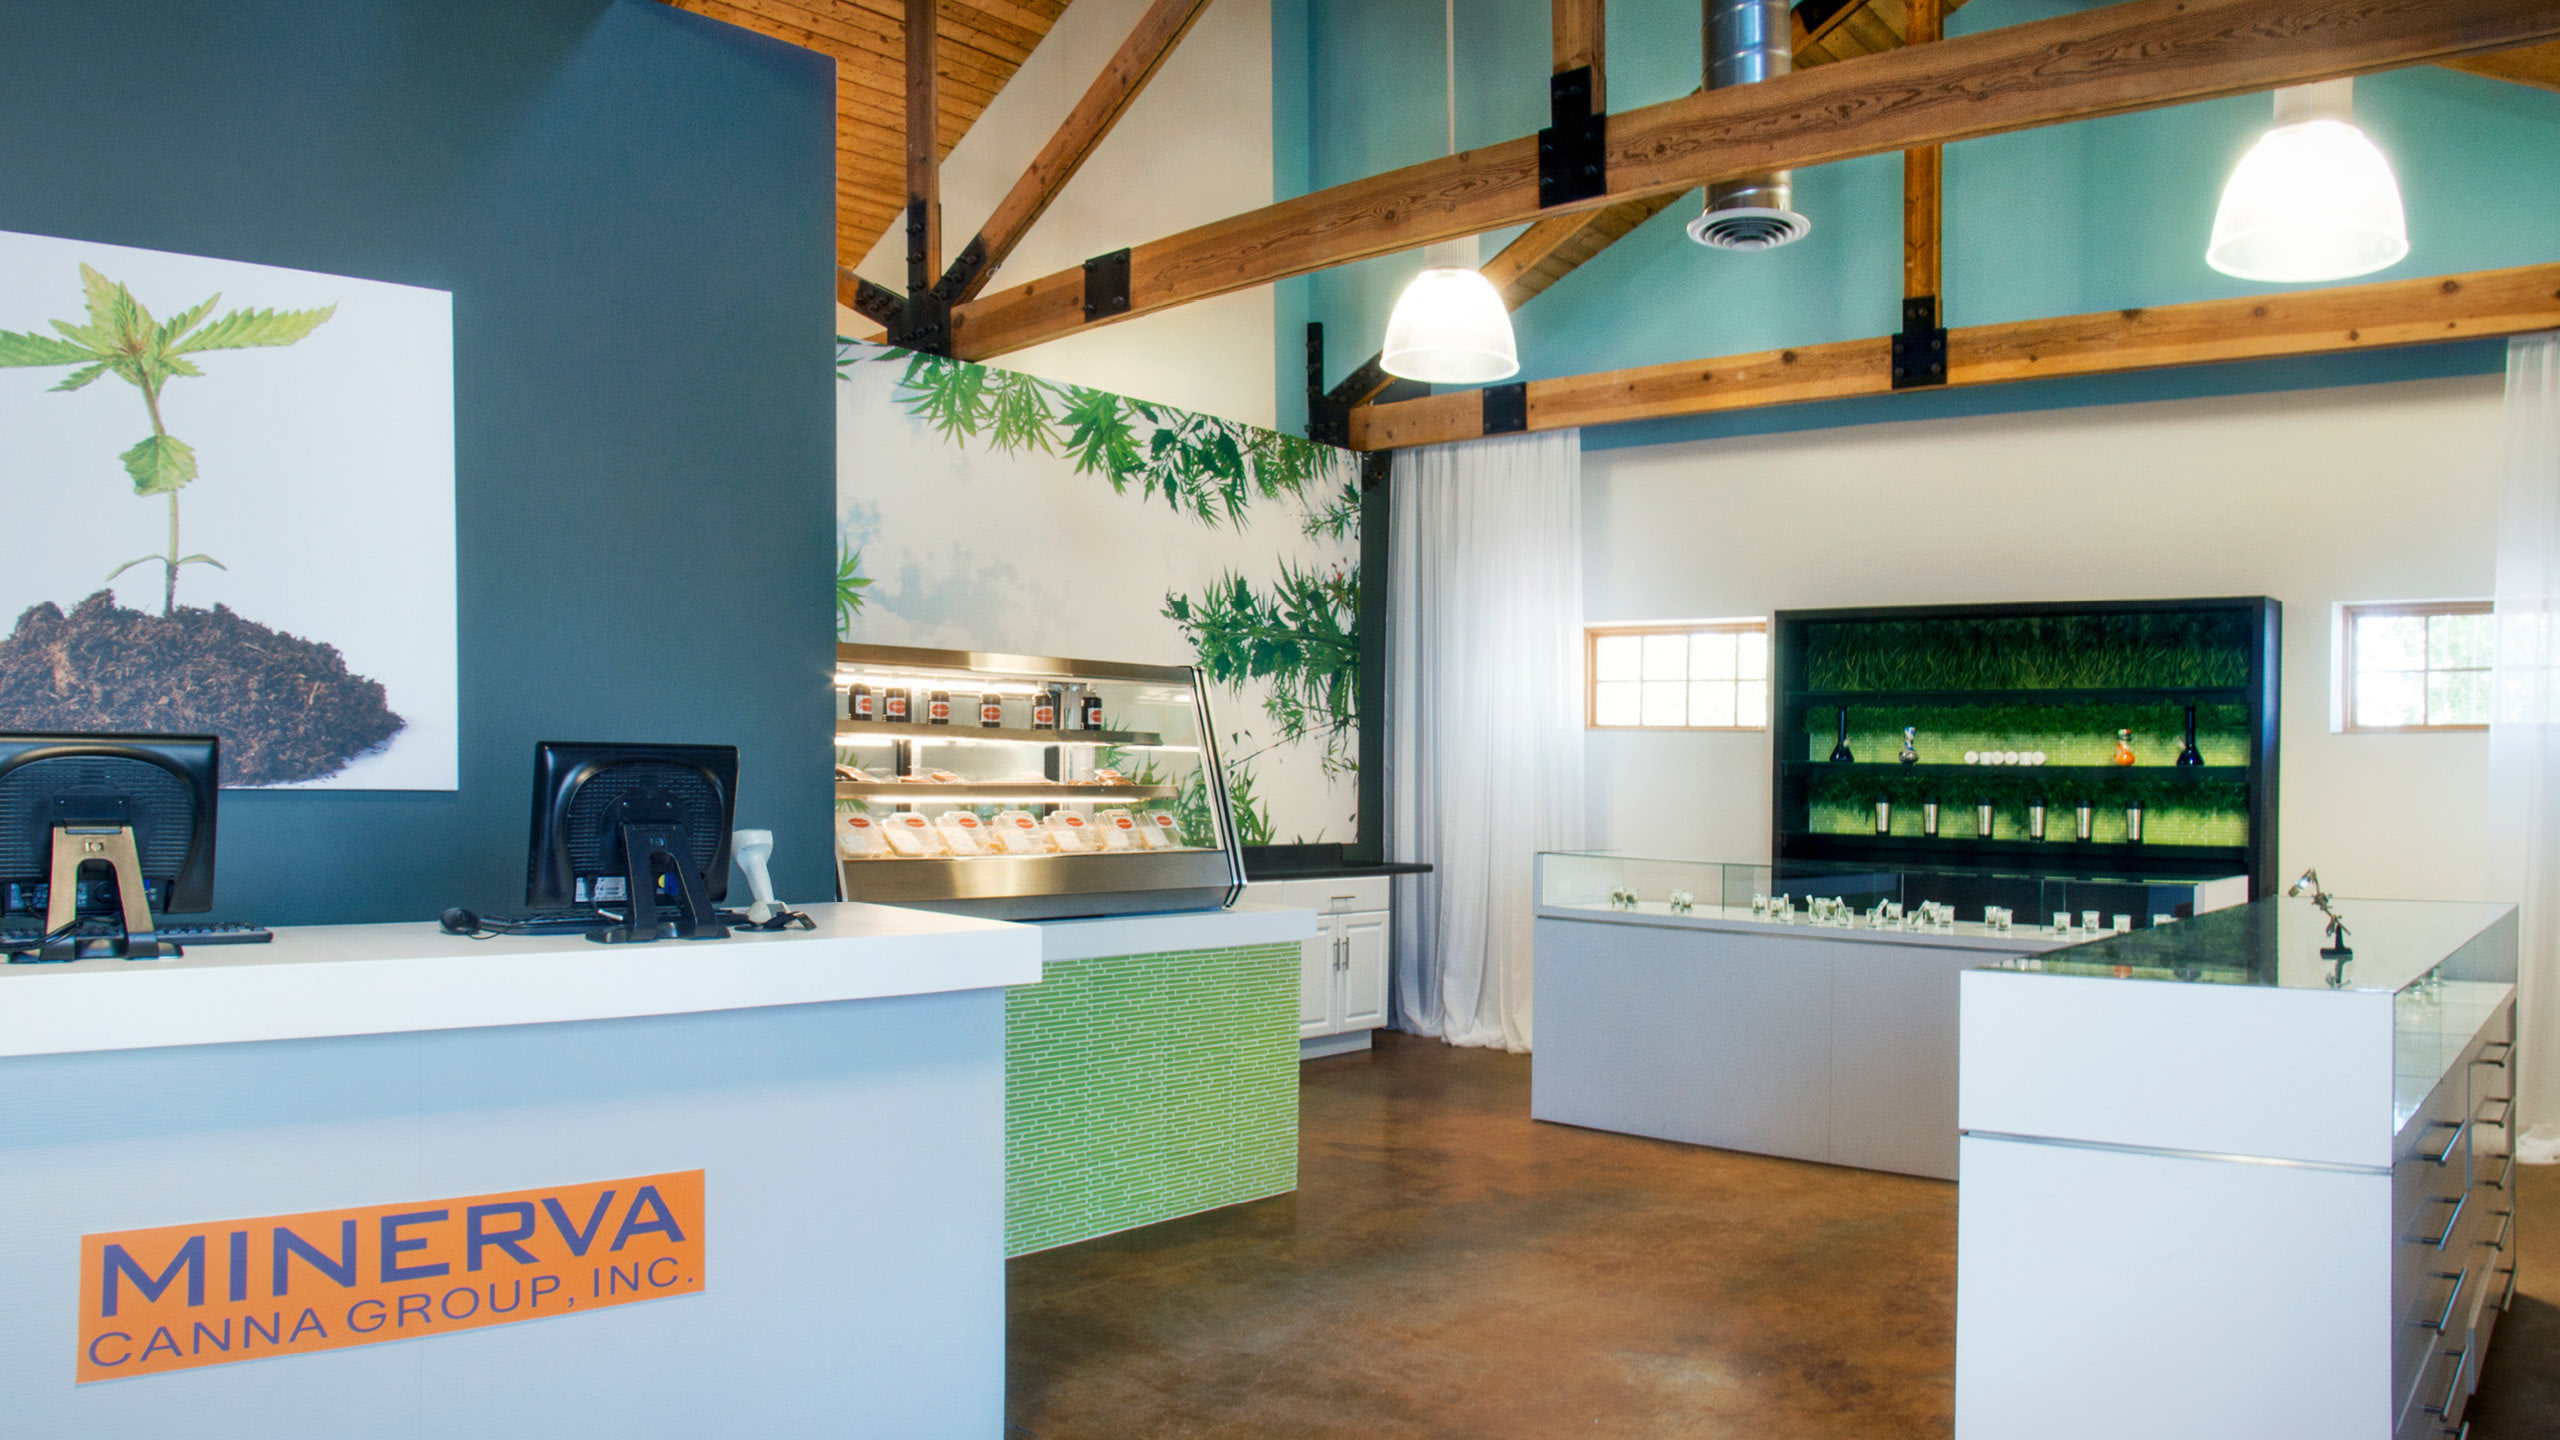 Minerva Canna Group Dispensary Interior Design by High Road Design Studio